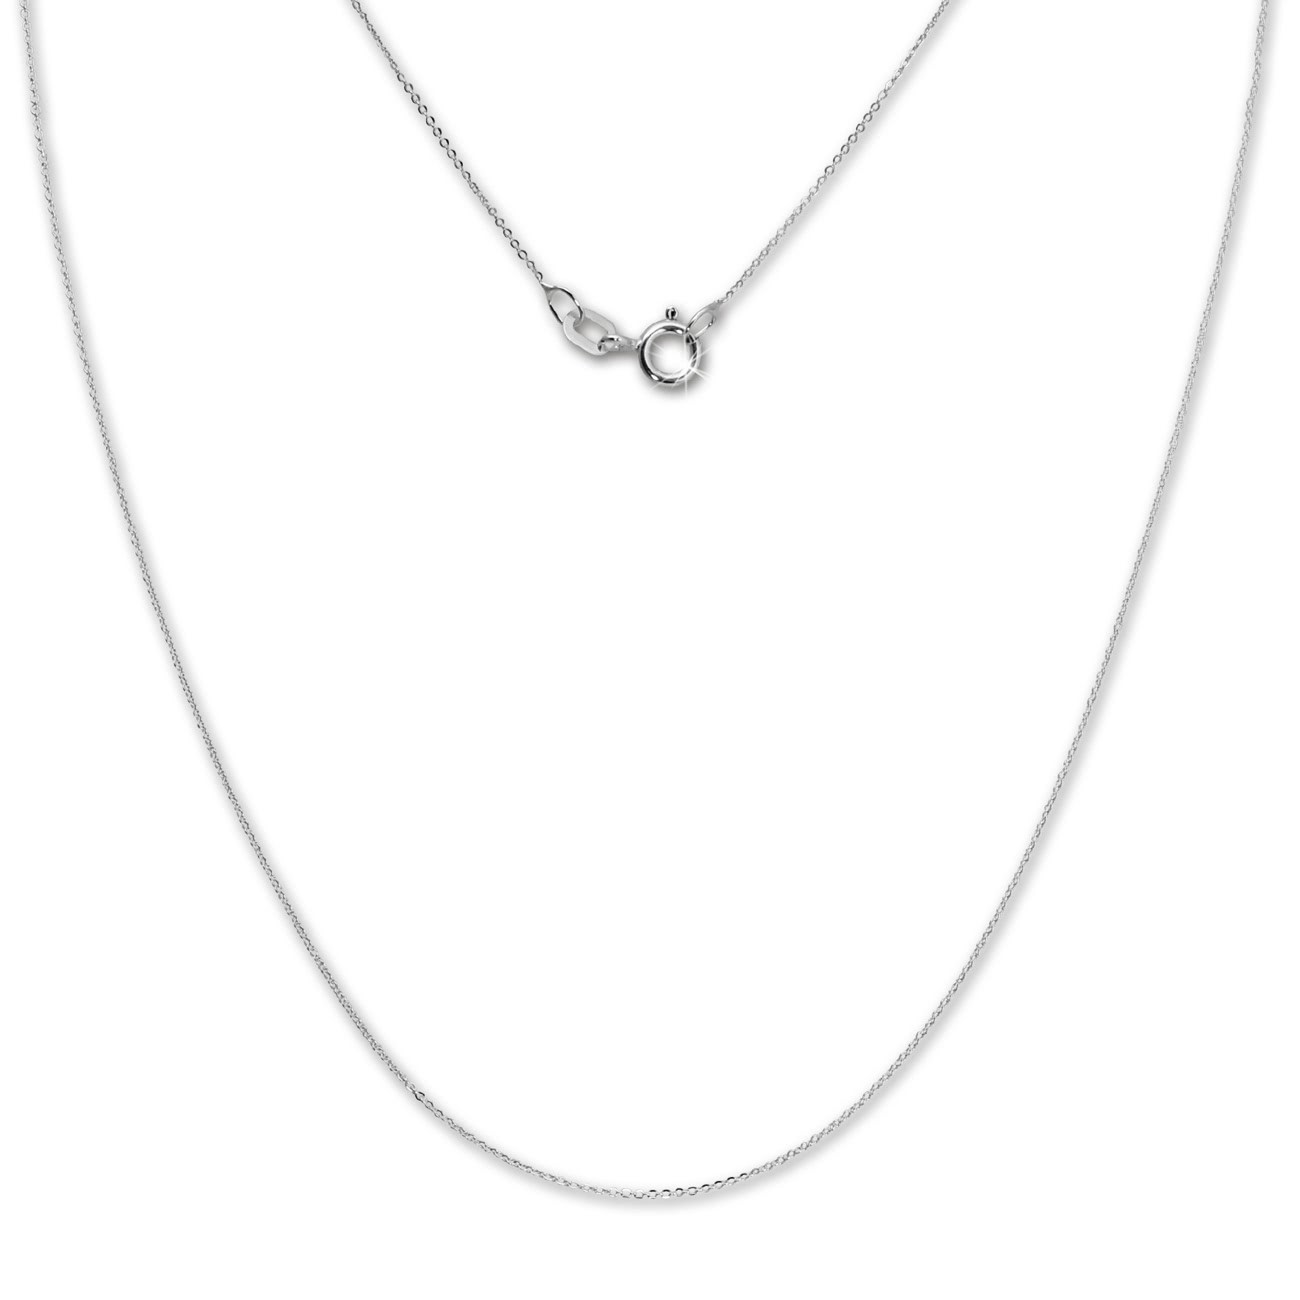 SilberDream Kette Anker flach 45cm silber 925 Silber Damen SDK26145J